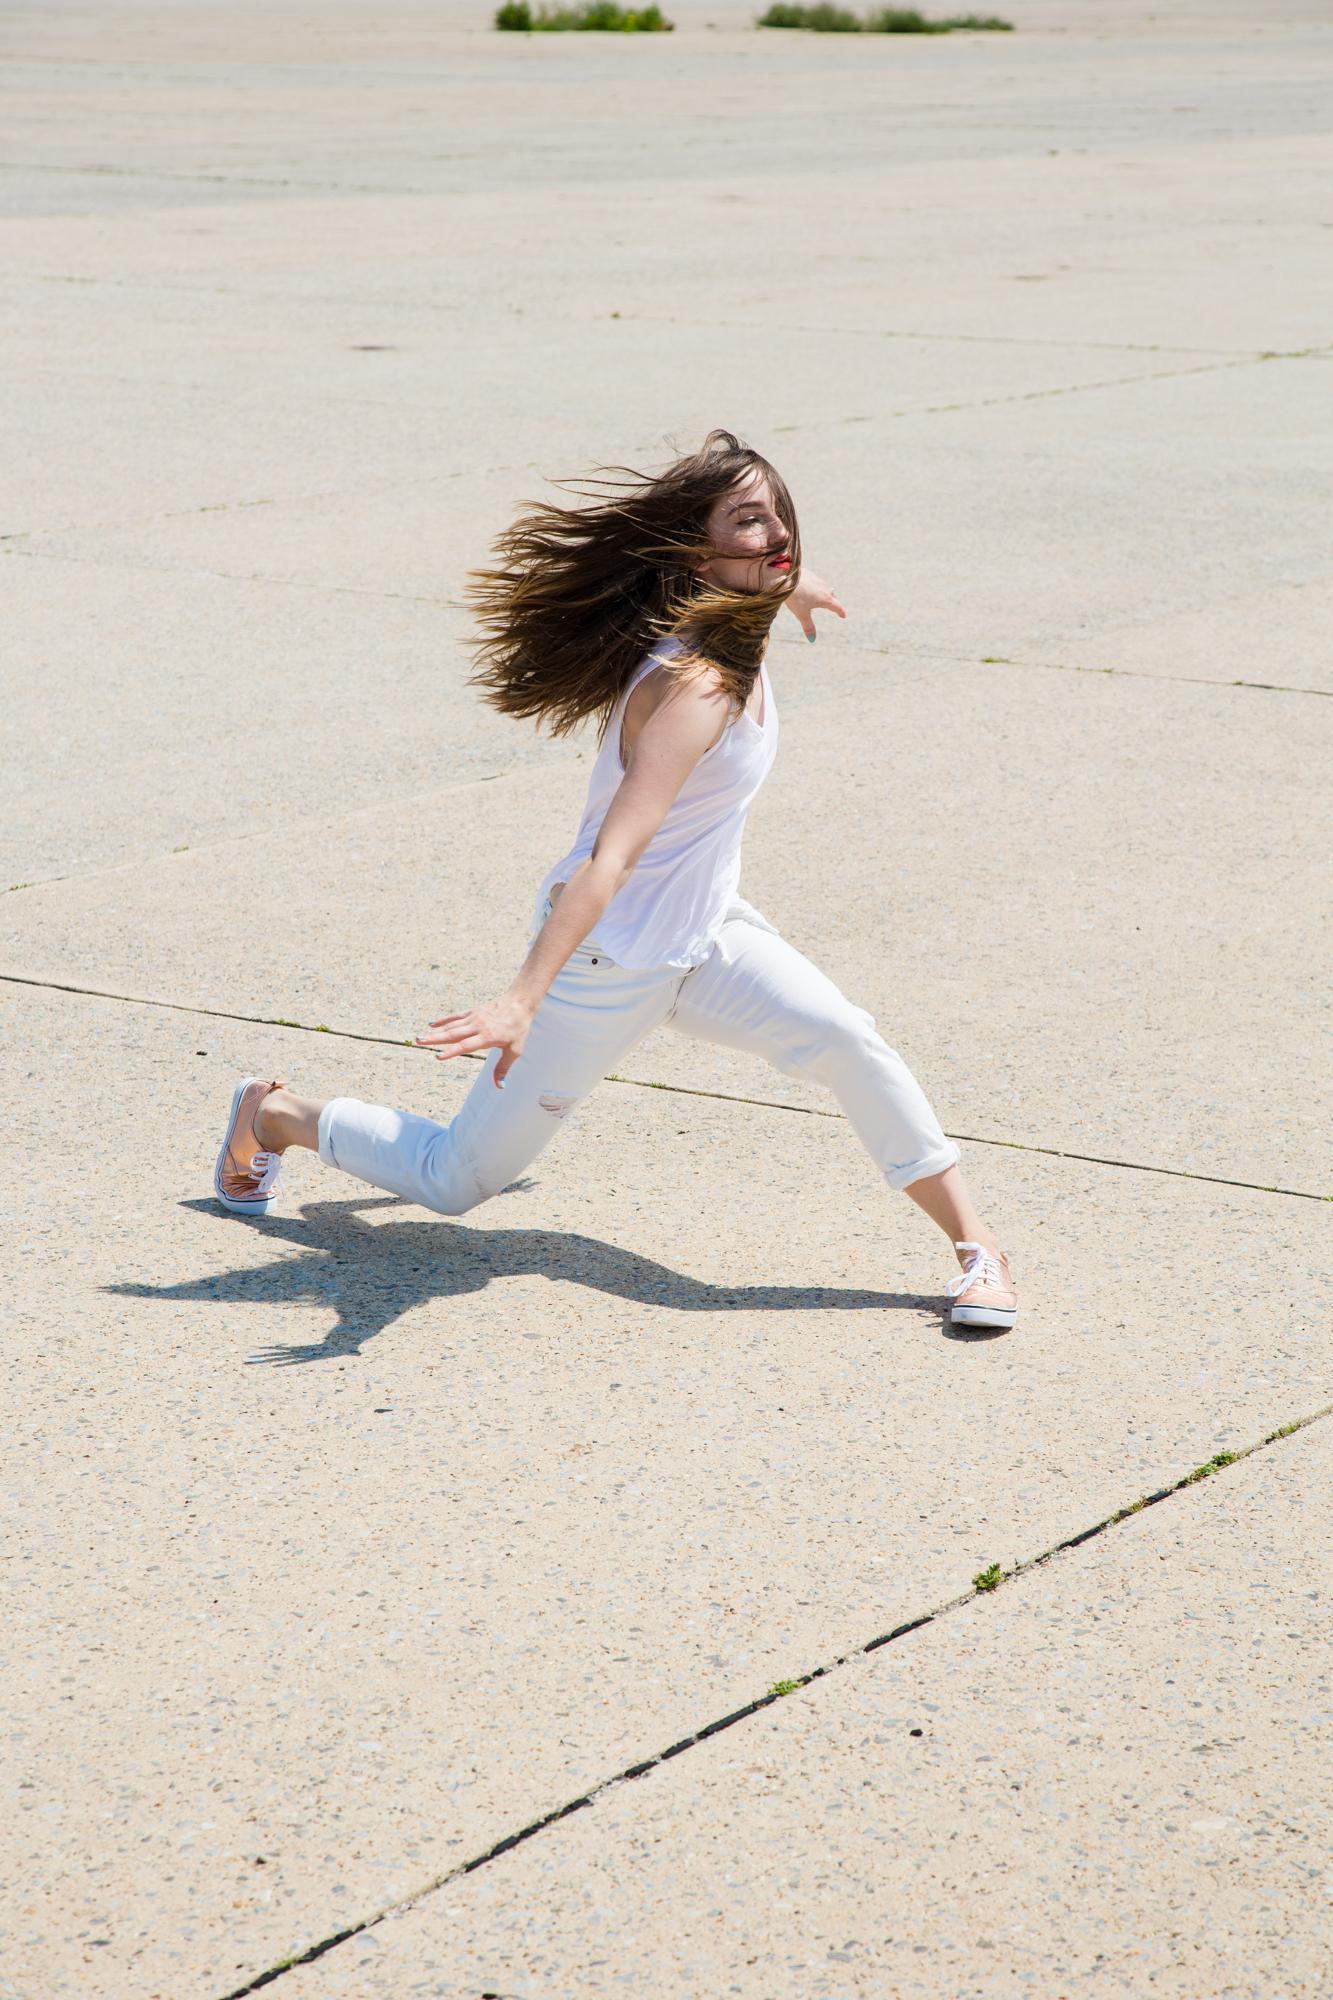 Rockaway Summer Dance Series_Photos by Daniel Terna_FIRST ROUGH SELECTS-57.jpg